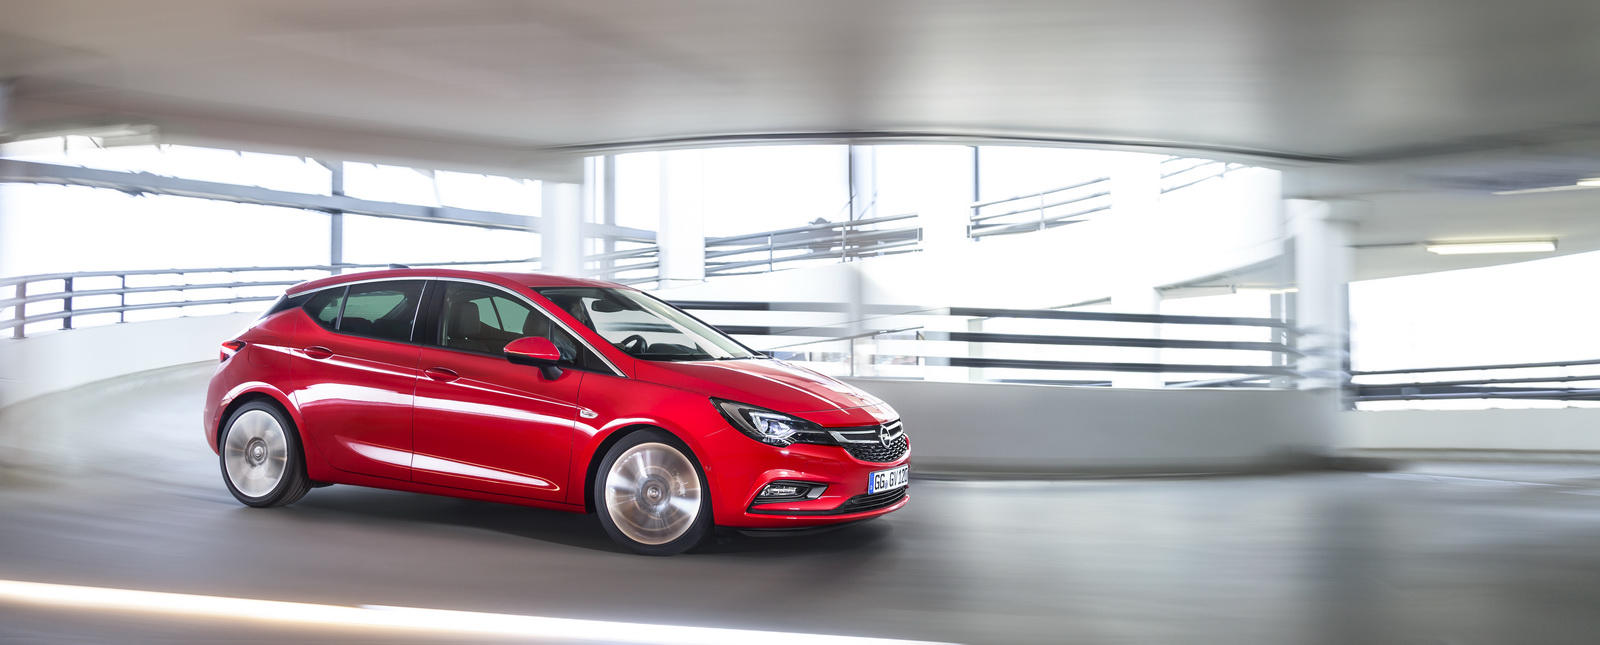 Opel Astra 2016 - Opel Astra 2016